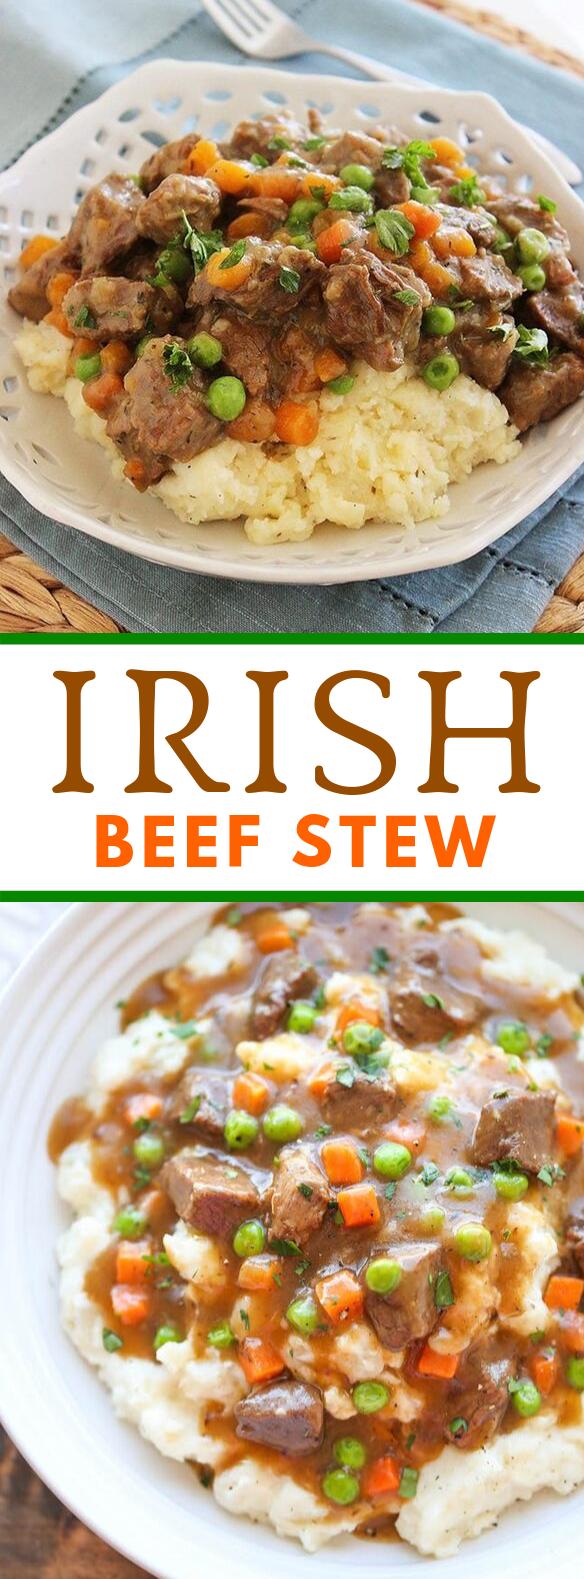 IRISH BEEF STEW #dinner #slowcooker